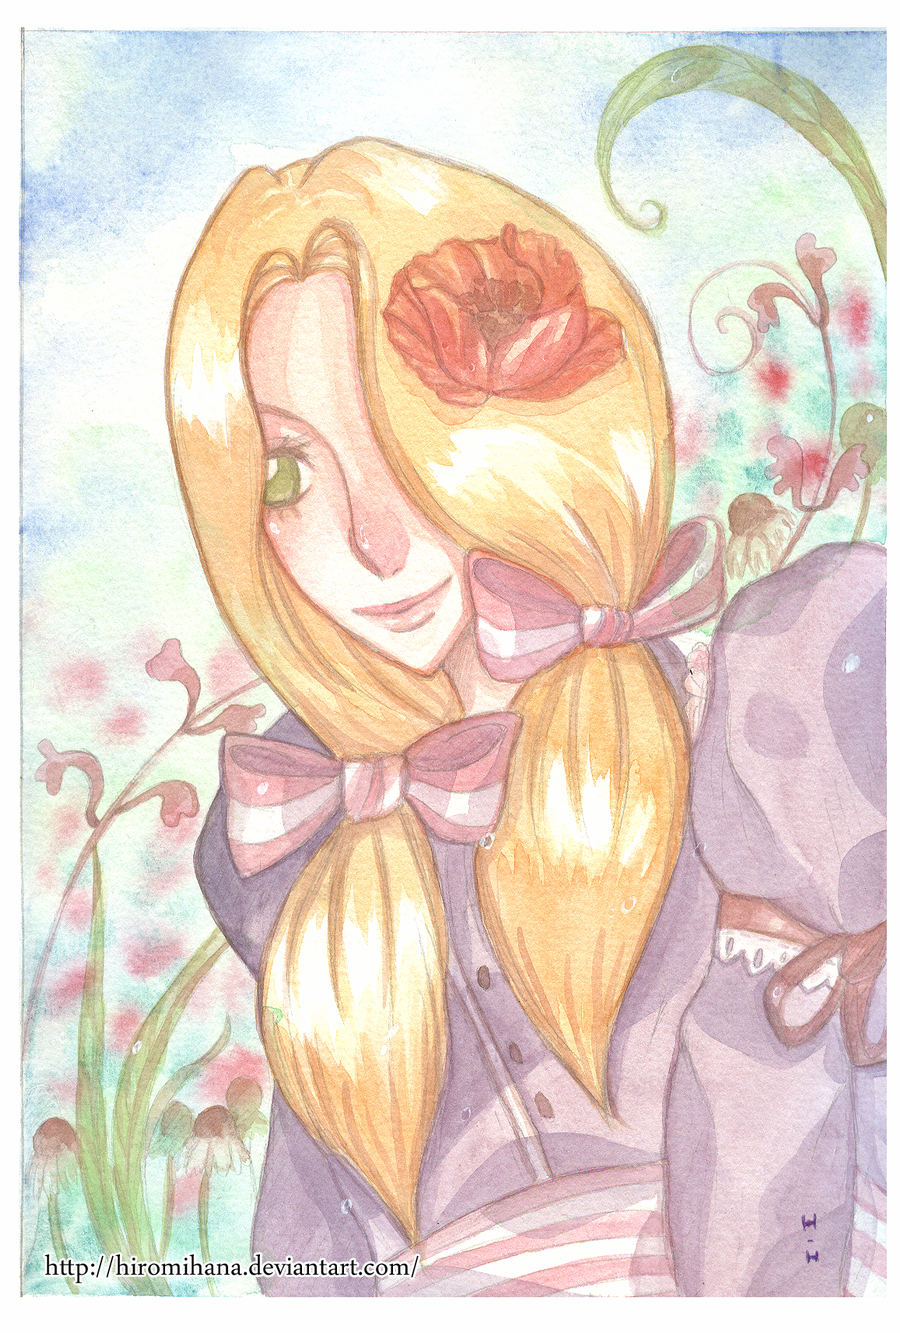 Iris by hiromihana